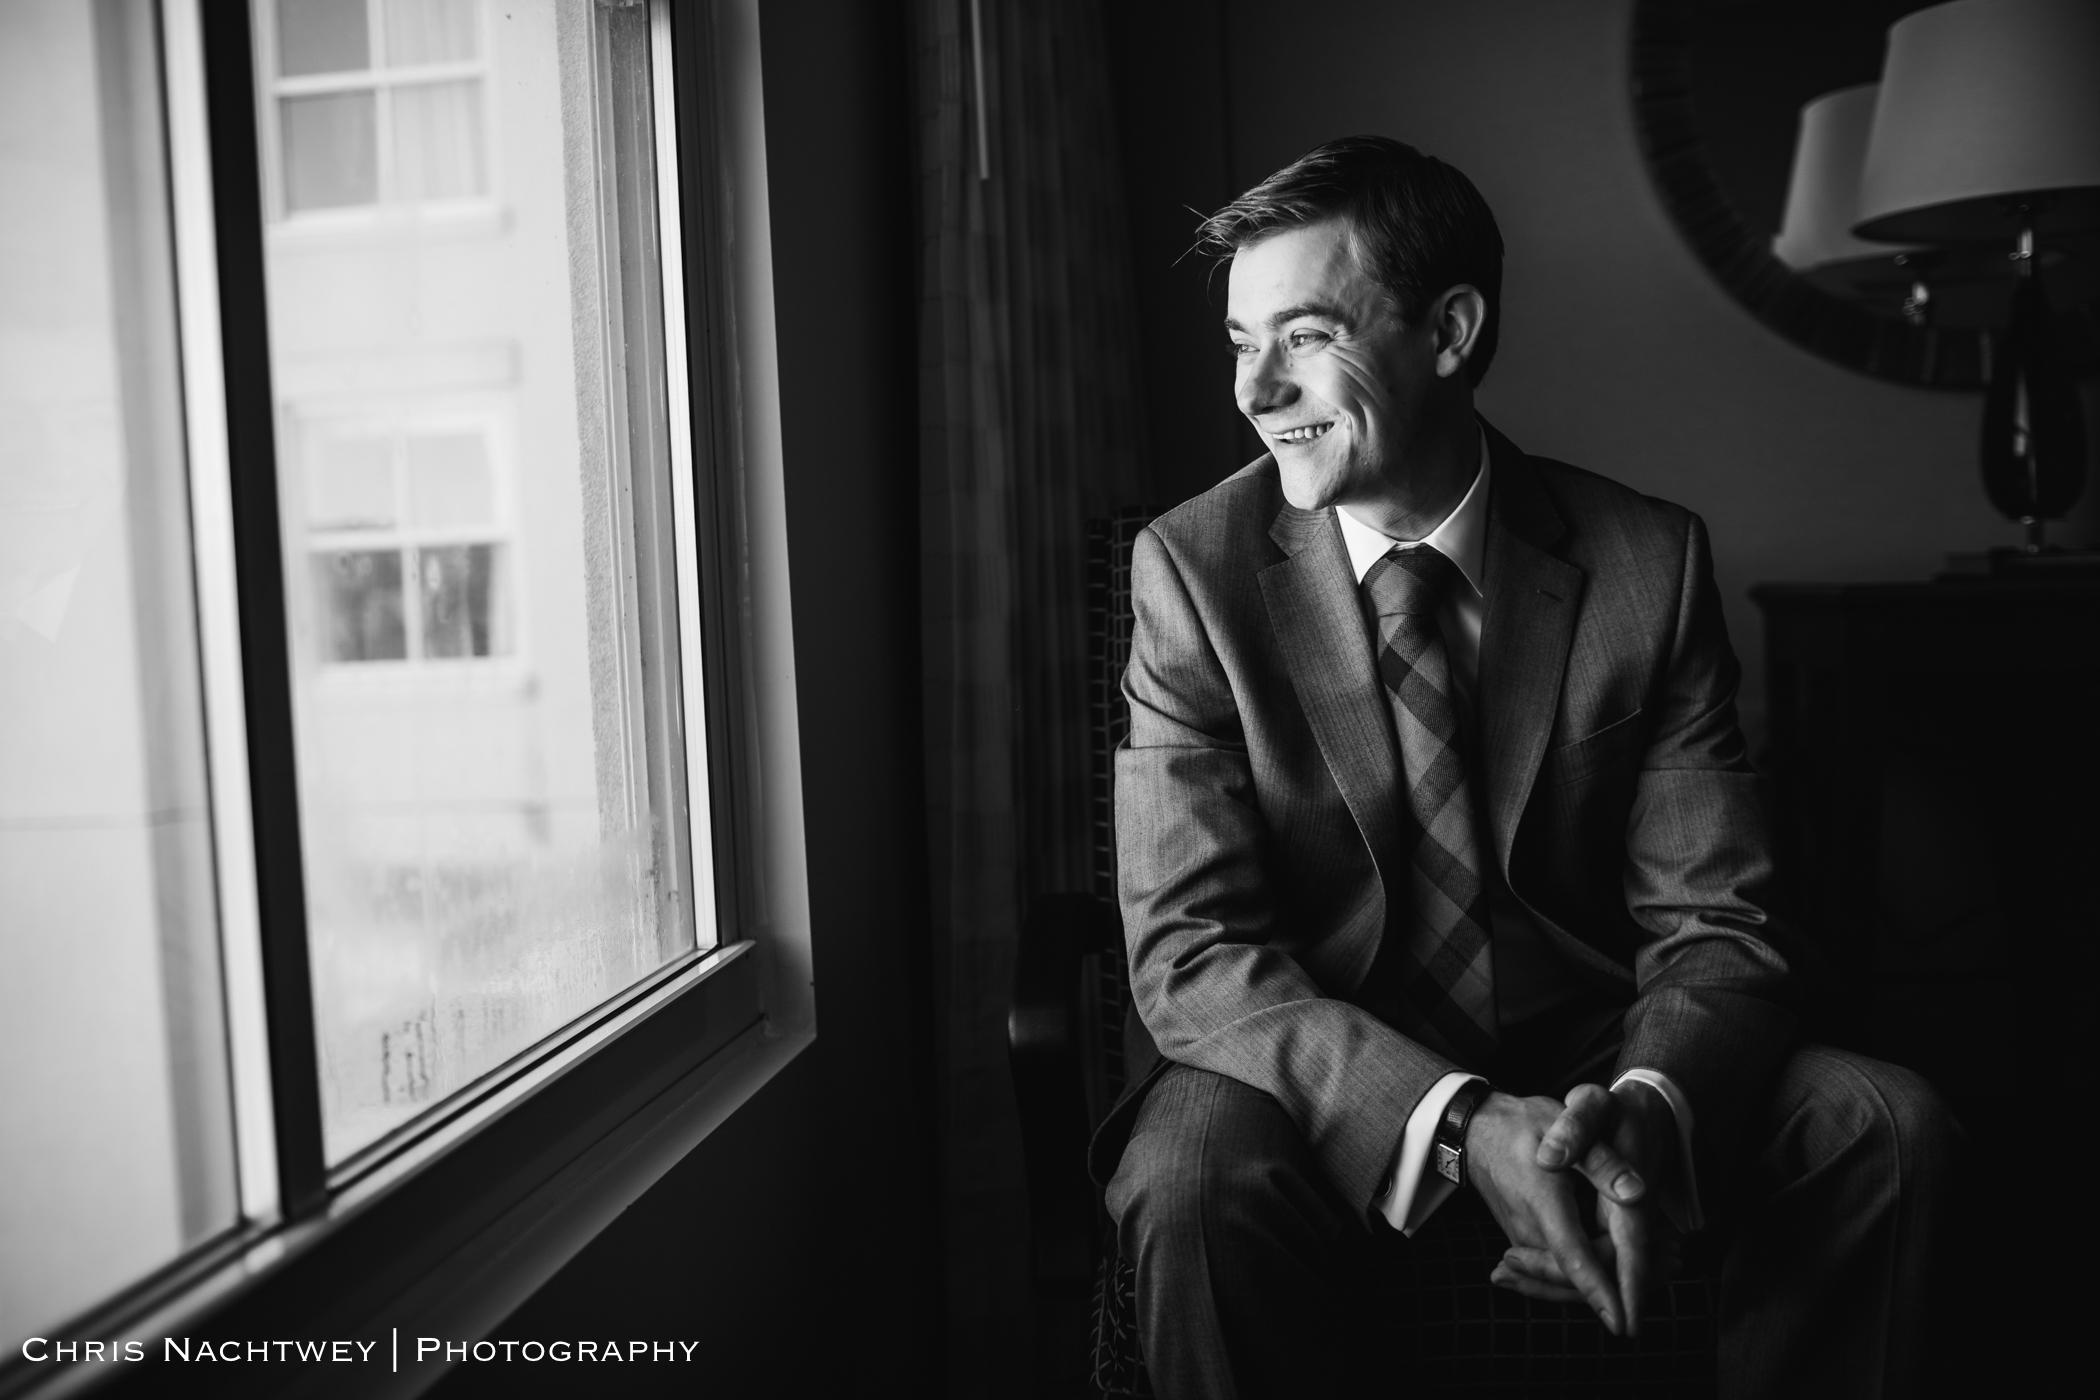 harkness-wedding-photos-chris-nachtwey-photography-2018-3.jpg